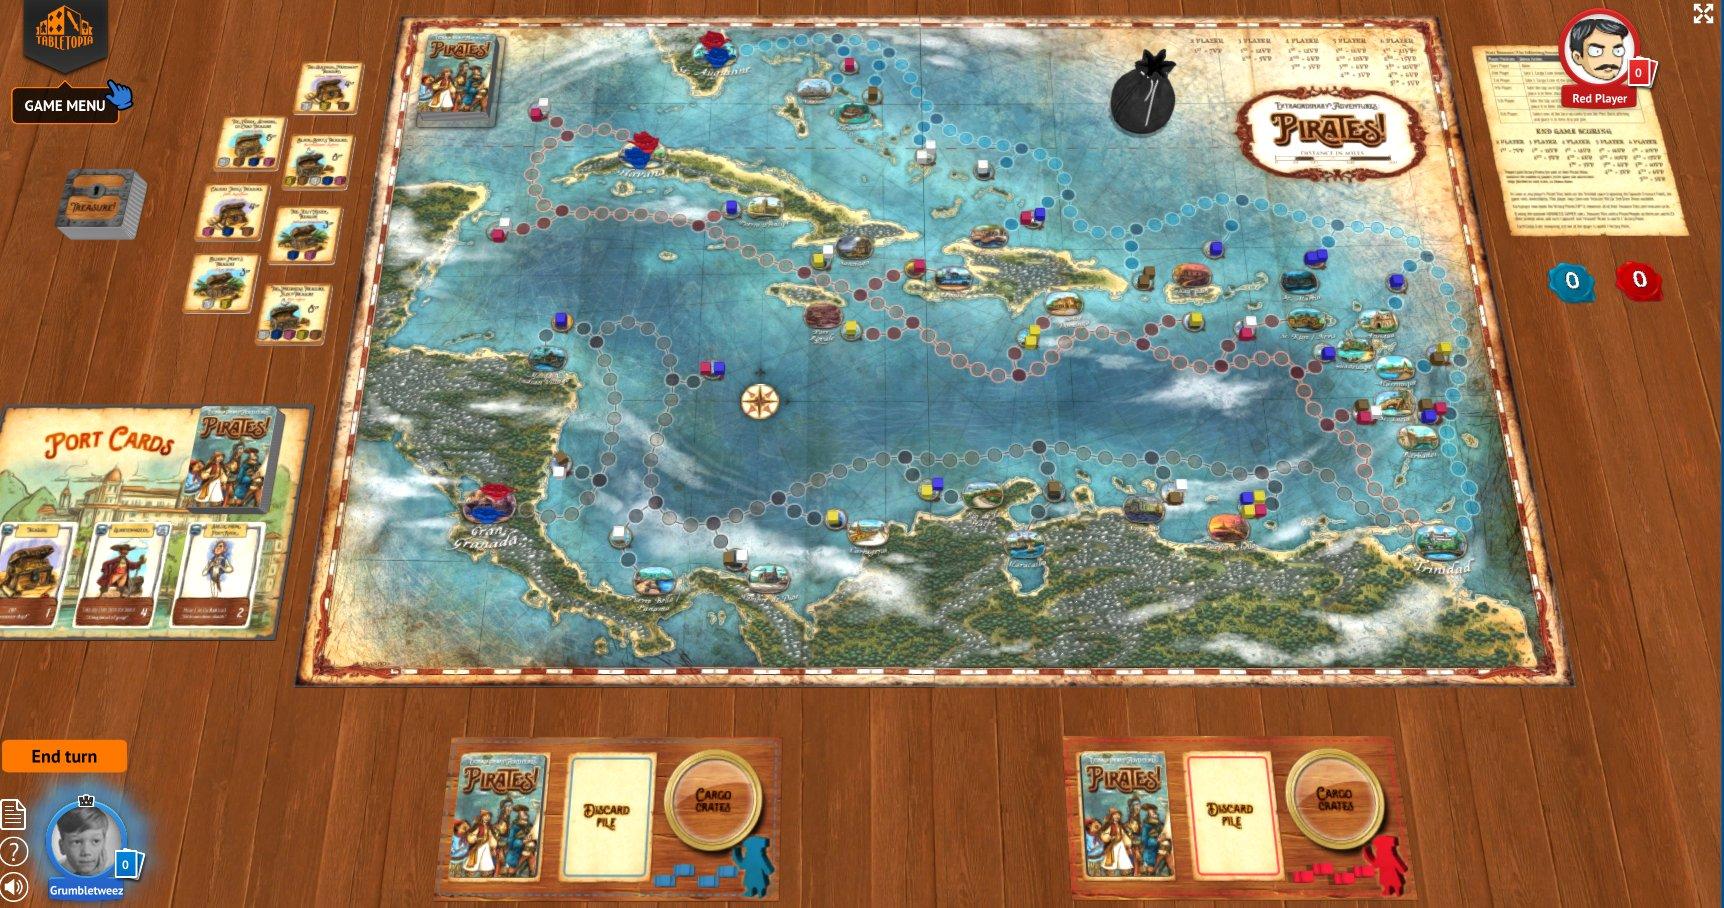 Extrodinary Adventures: Pirates!